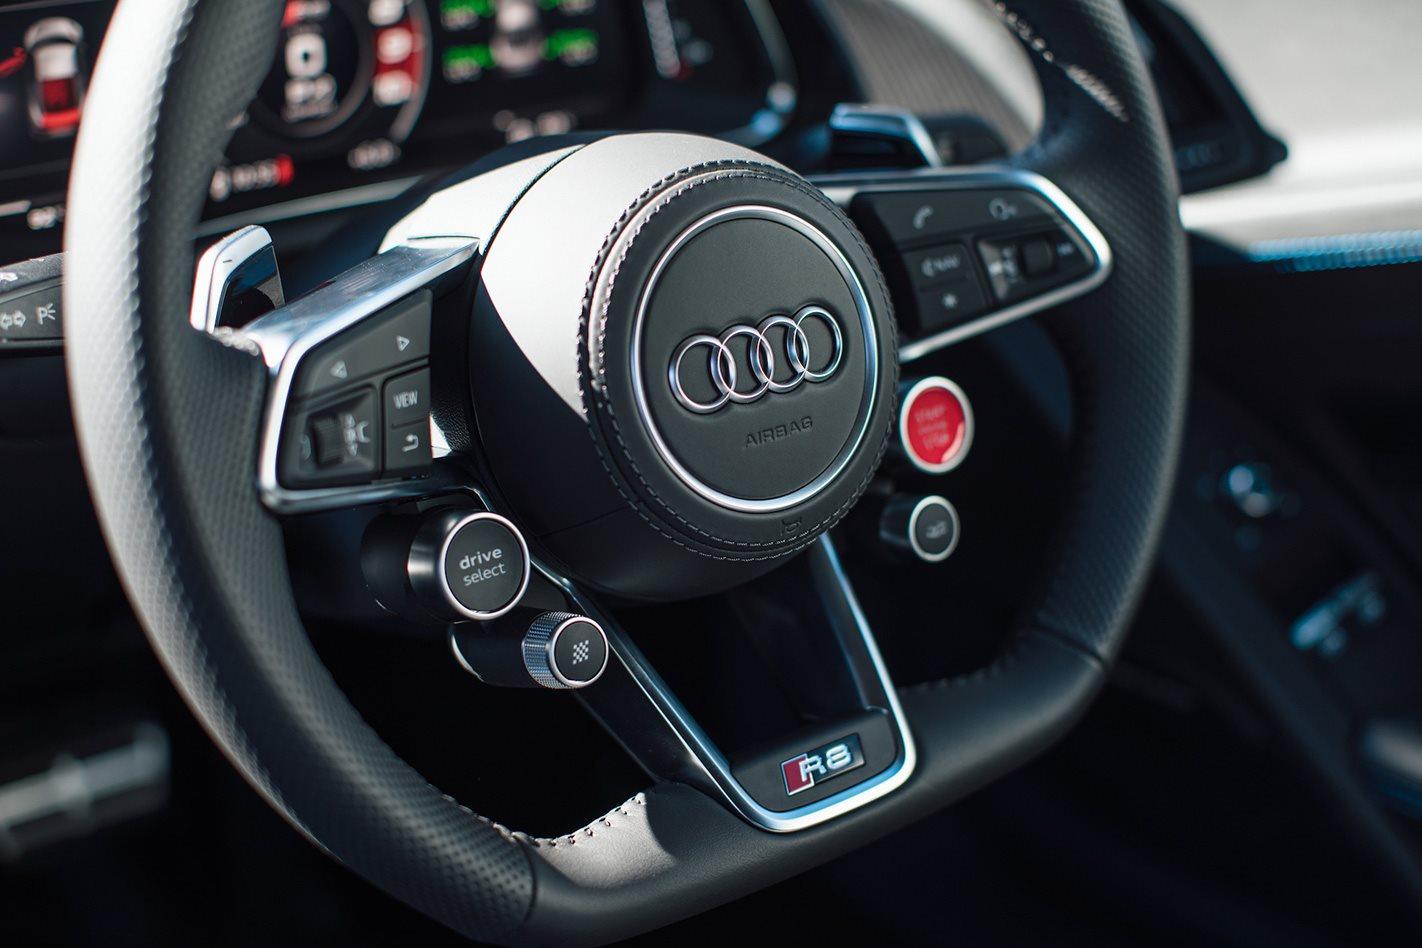 hybrid Audi TT and R8 Steering wheel